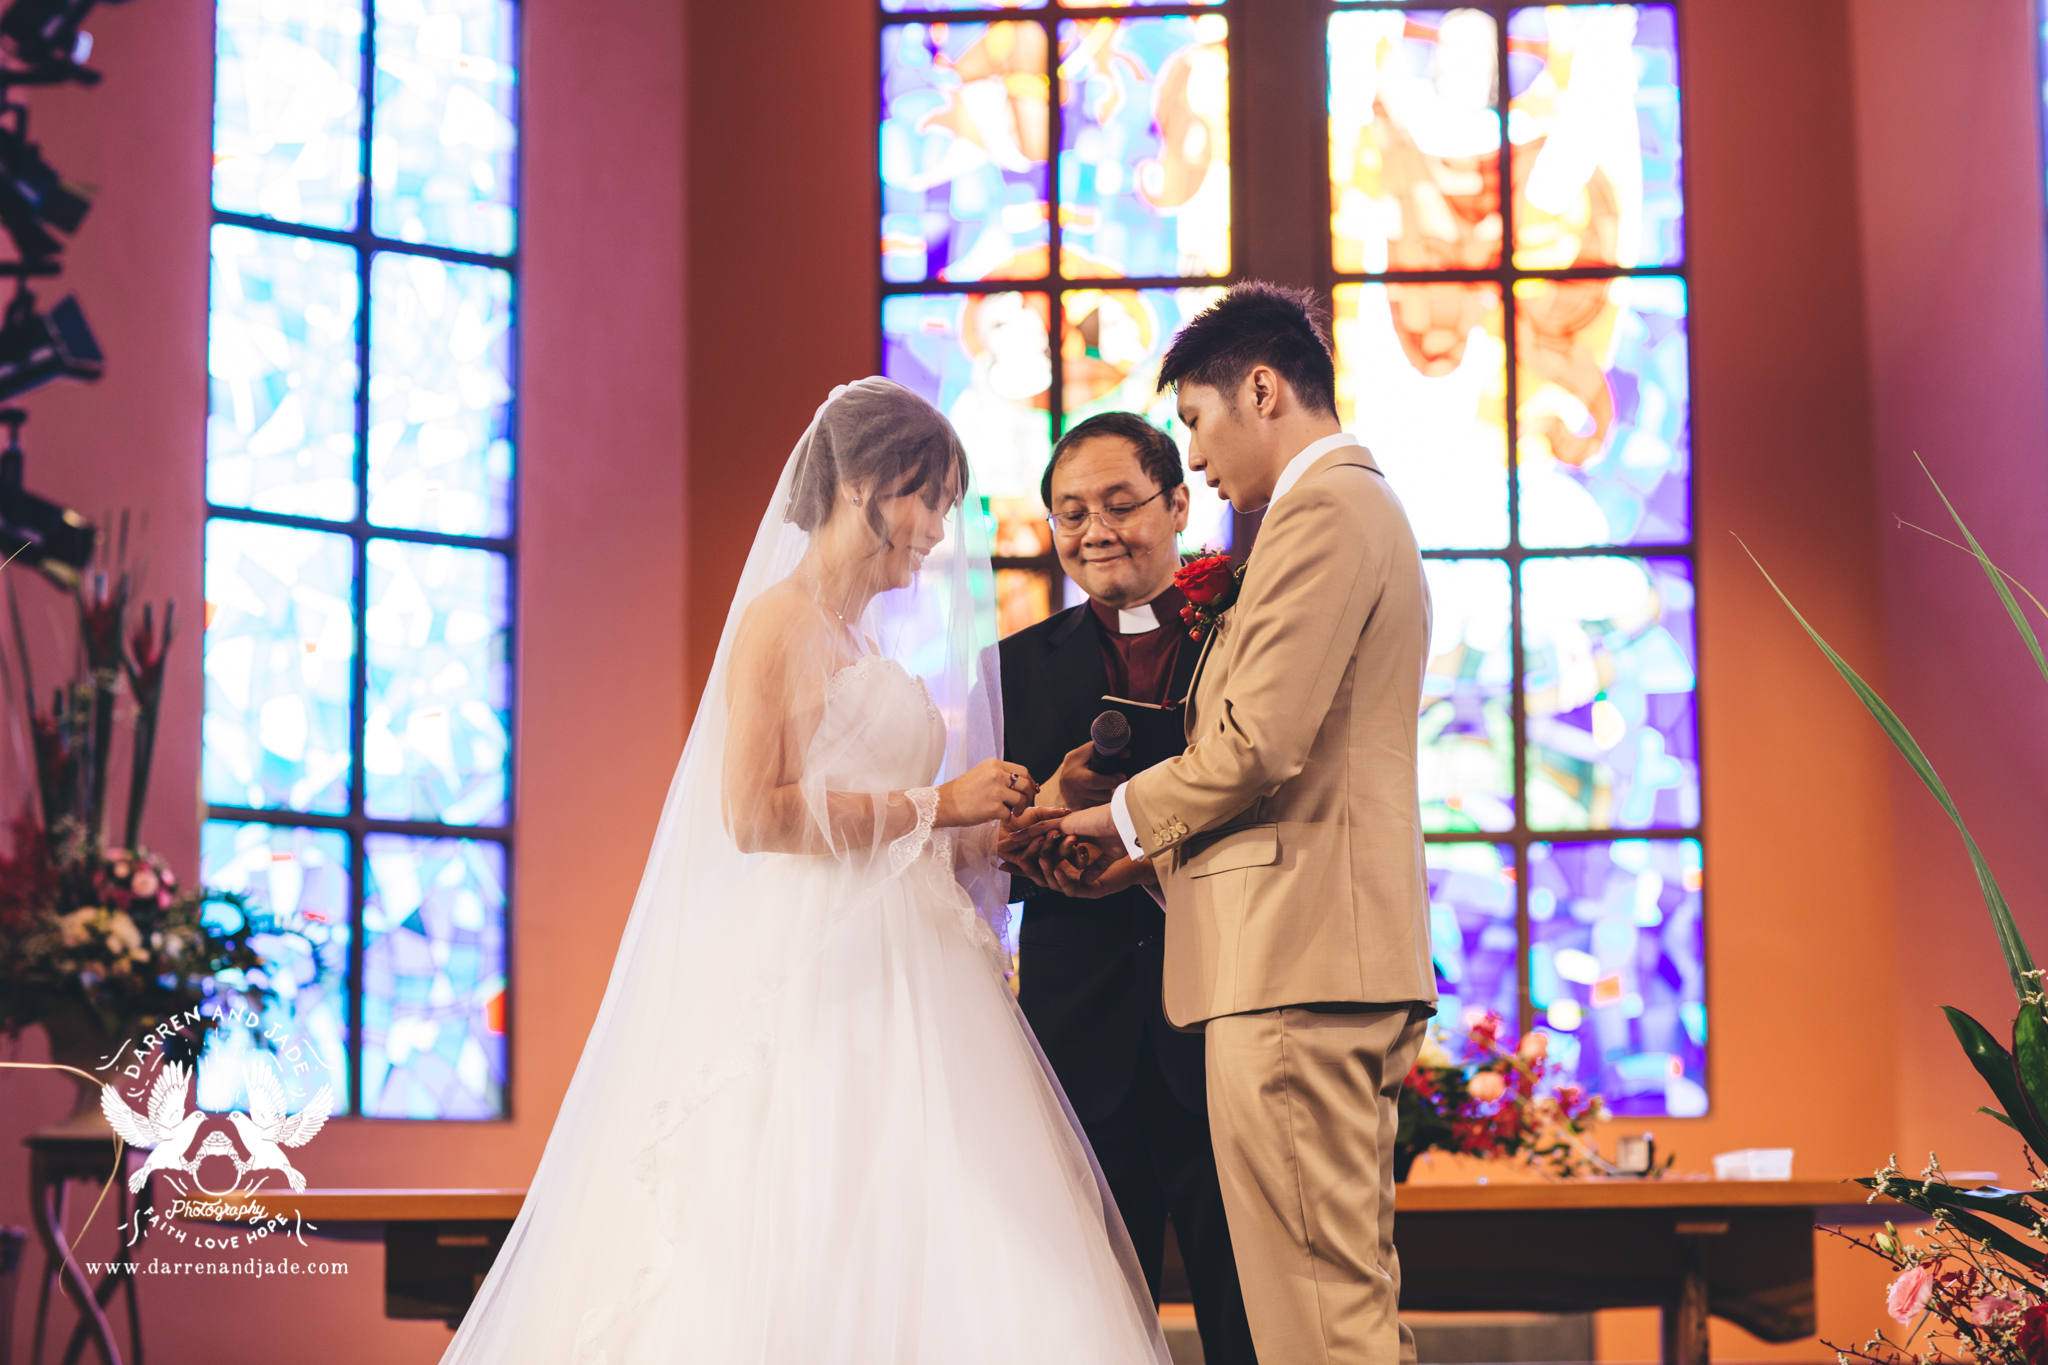 Bel & Emans - Wedding - Blog (51 of 69).jpg